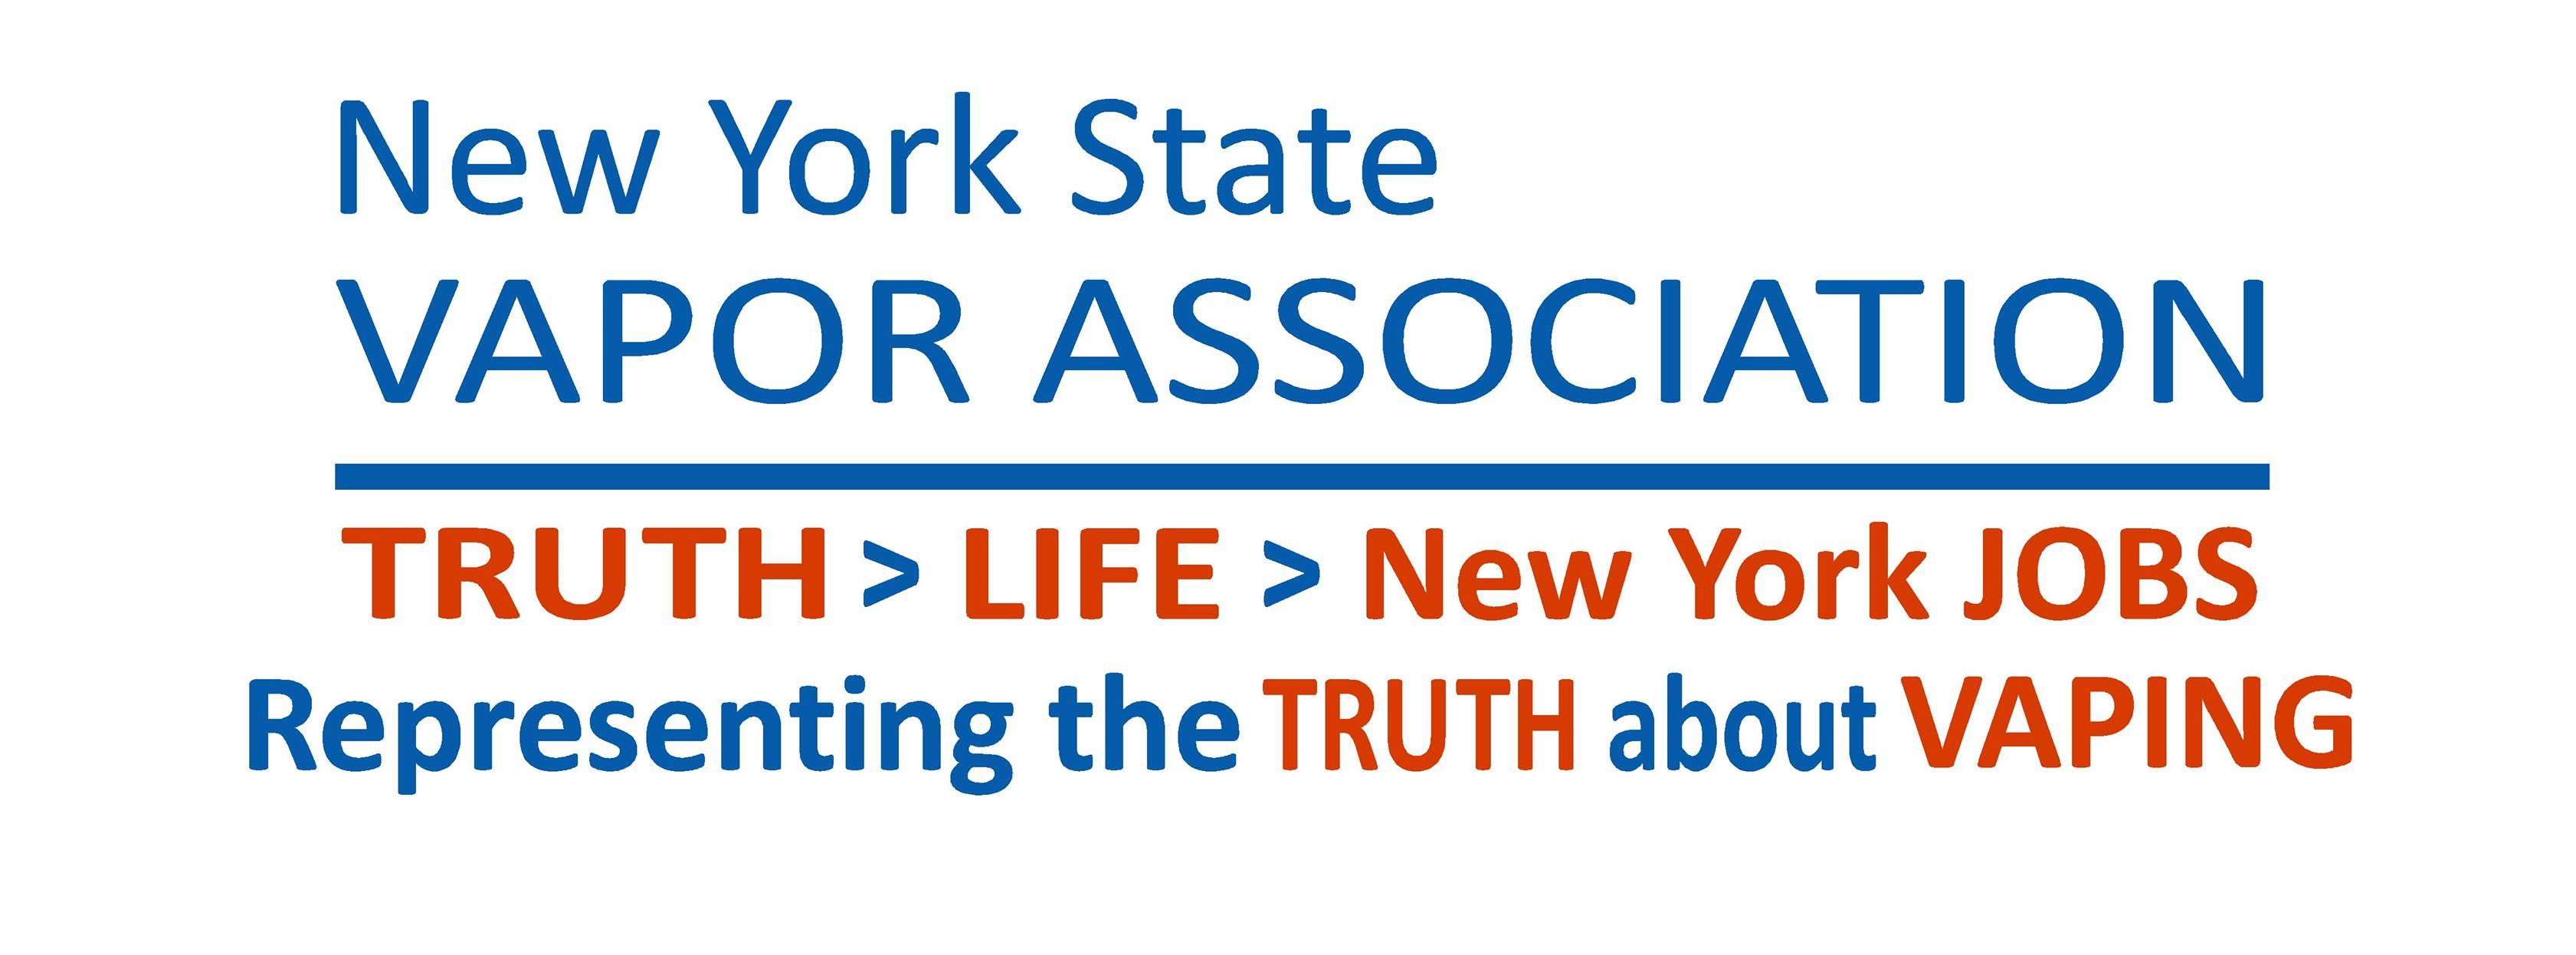 NYSVA org - New York State Vapor Association